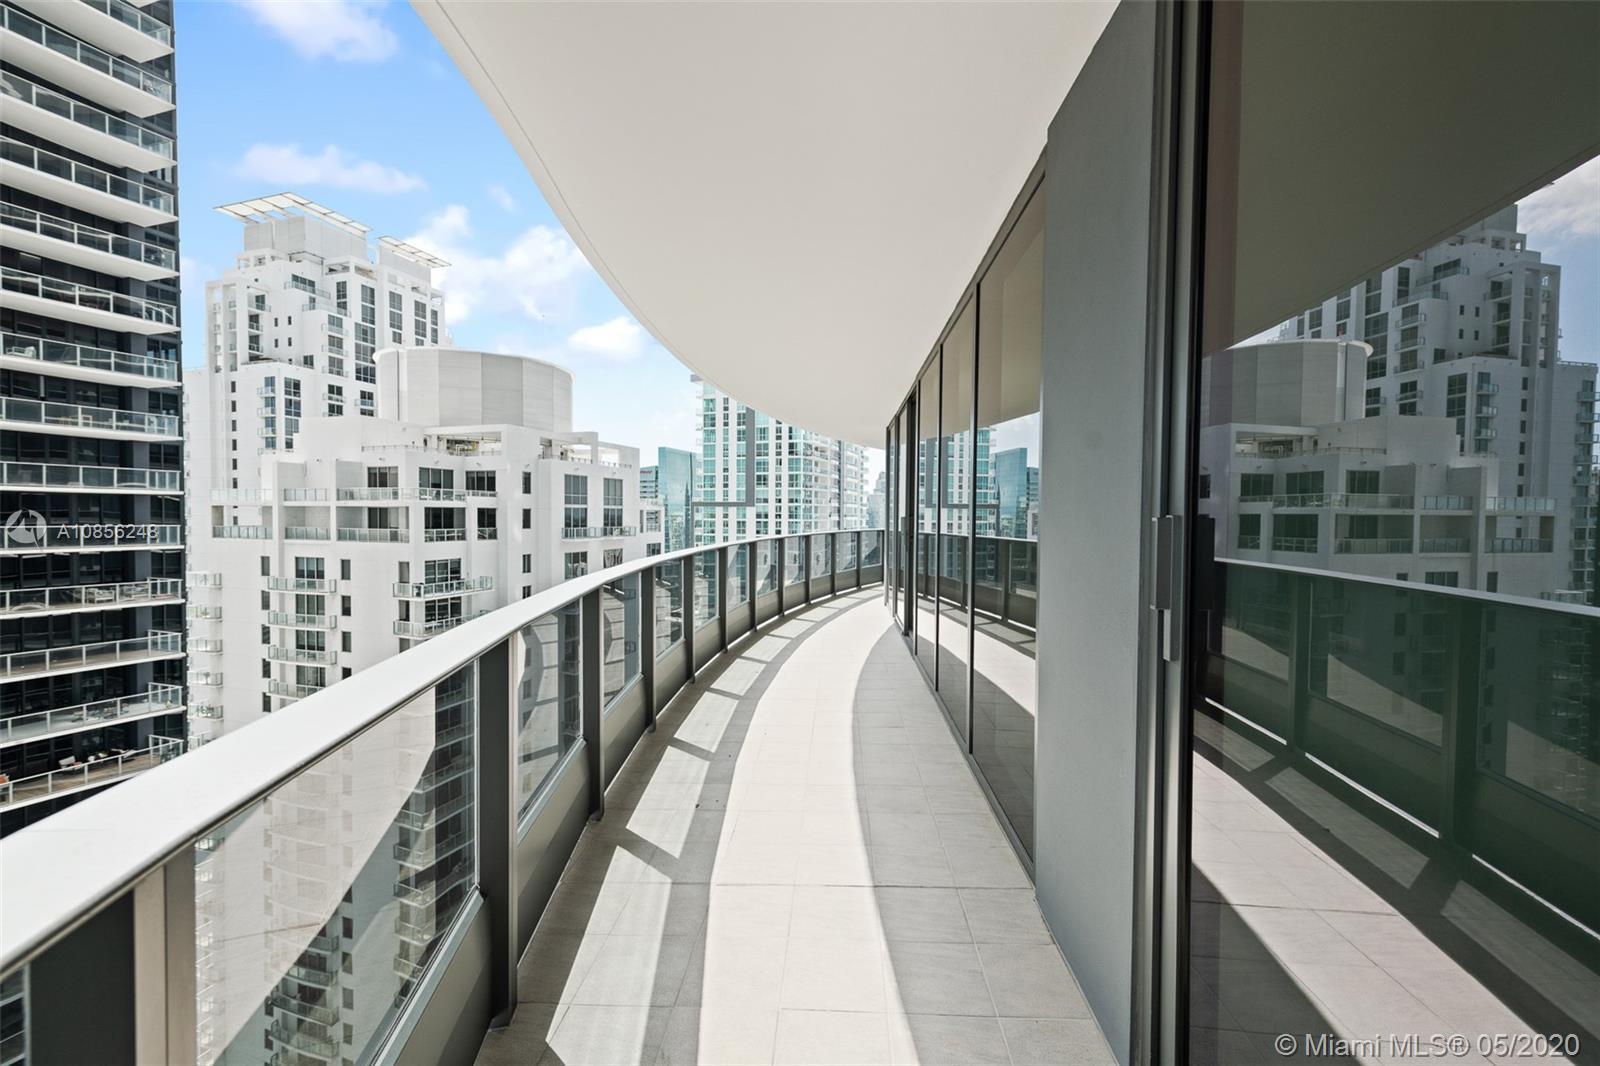 1000 Brickell Plaza # 3609, Miami, Florida 33131, 2 Bedrooms Bedrooms, ,3 BathroomsBathrooms,Residential,For Sale,1000 Brickell Plaza # 3609,A10856248